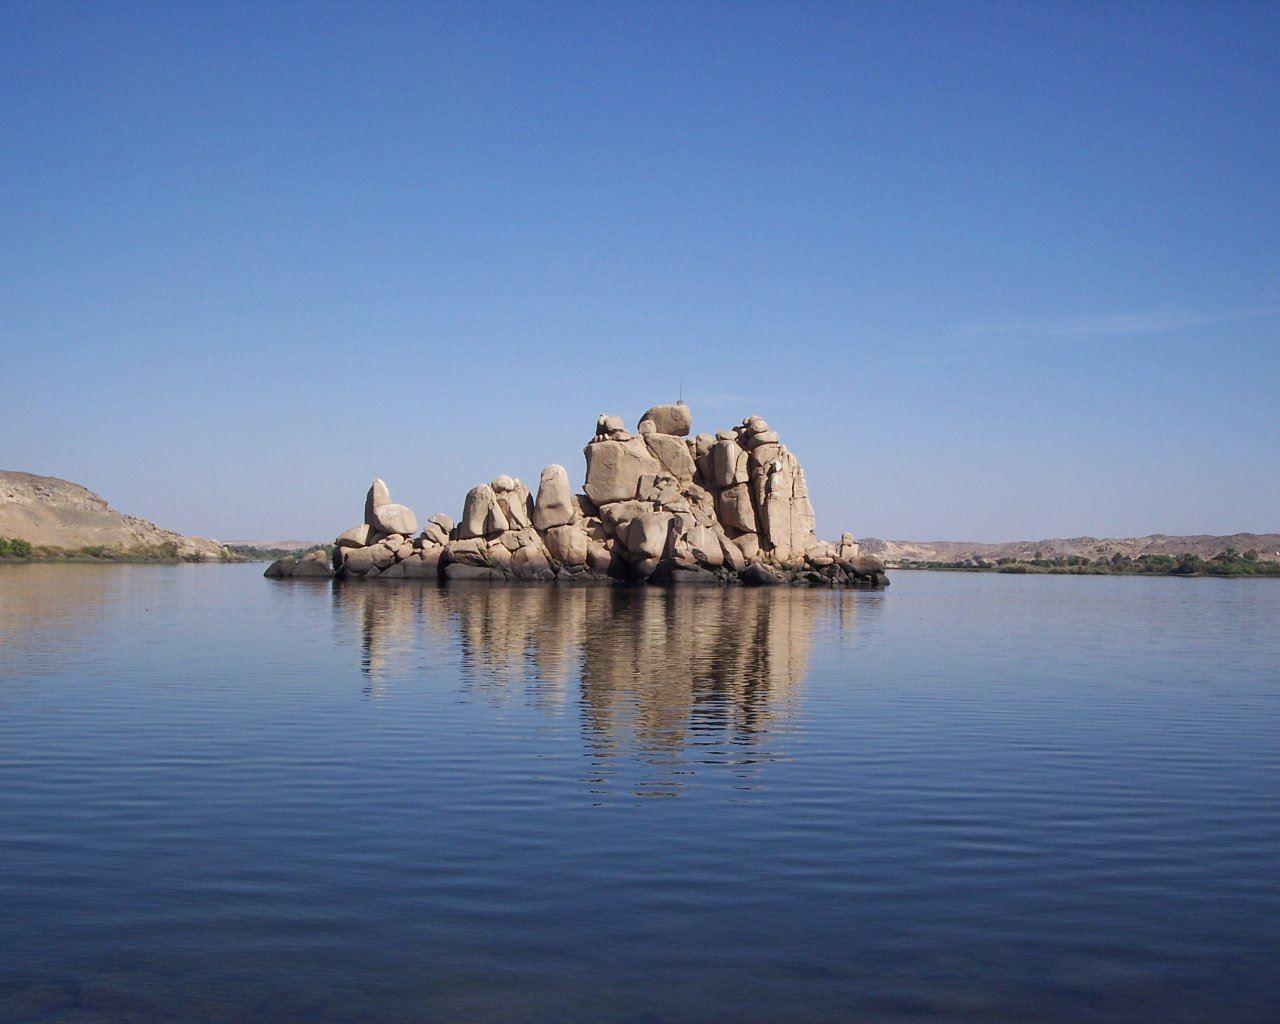 Egypt With Lake Nasser 11 Days Promo Travel